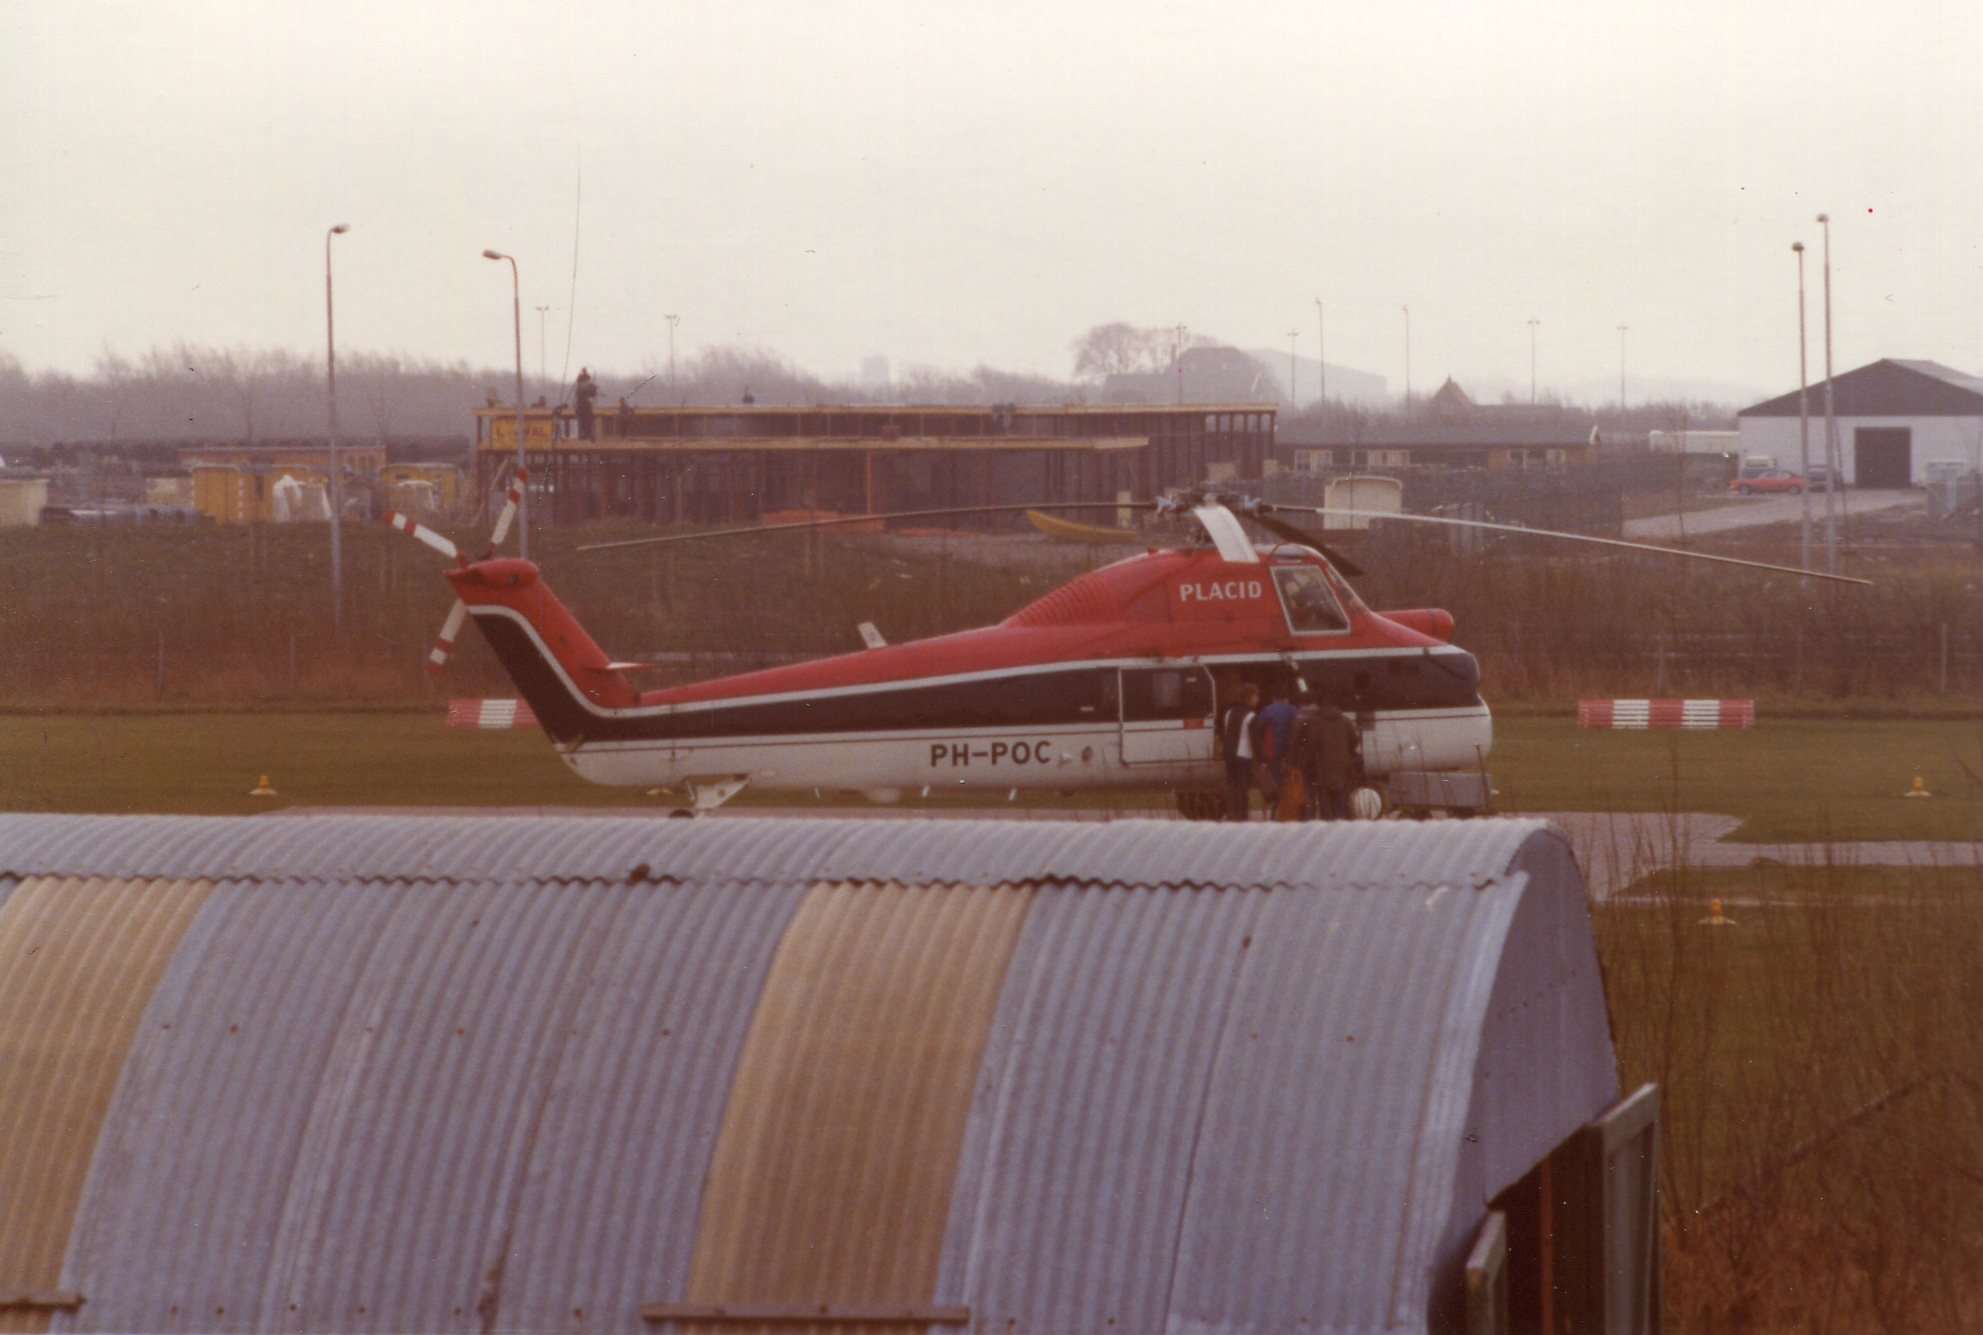 Naam: Den Helder , april 1977 (2).jpg Bekeken: 566 Grootte: 271,9 KB